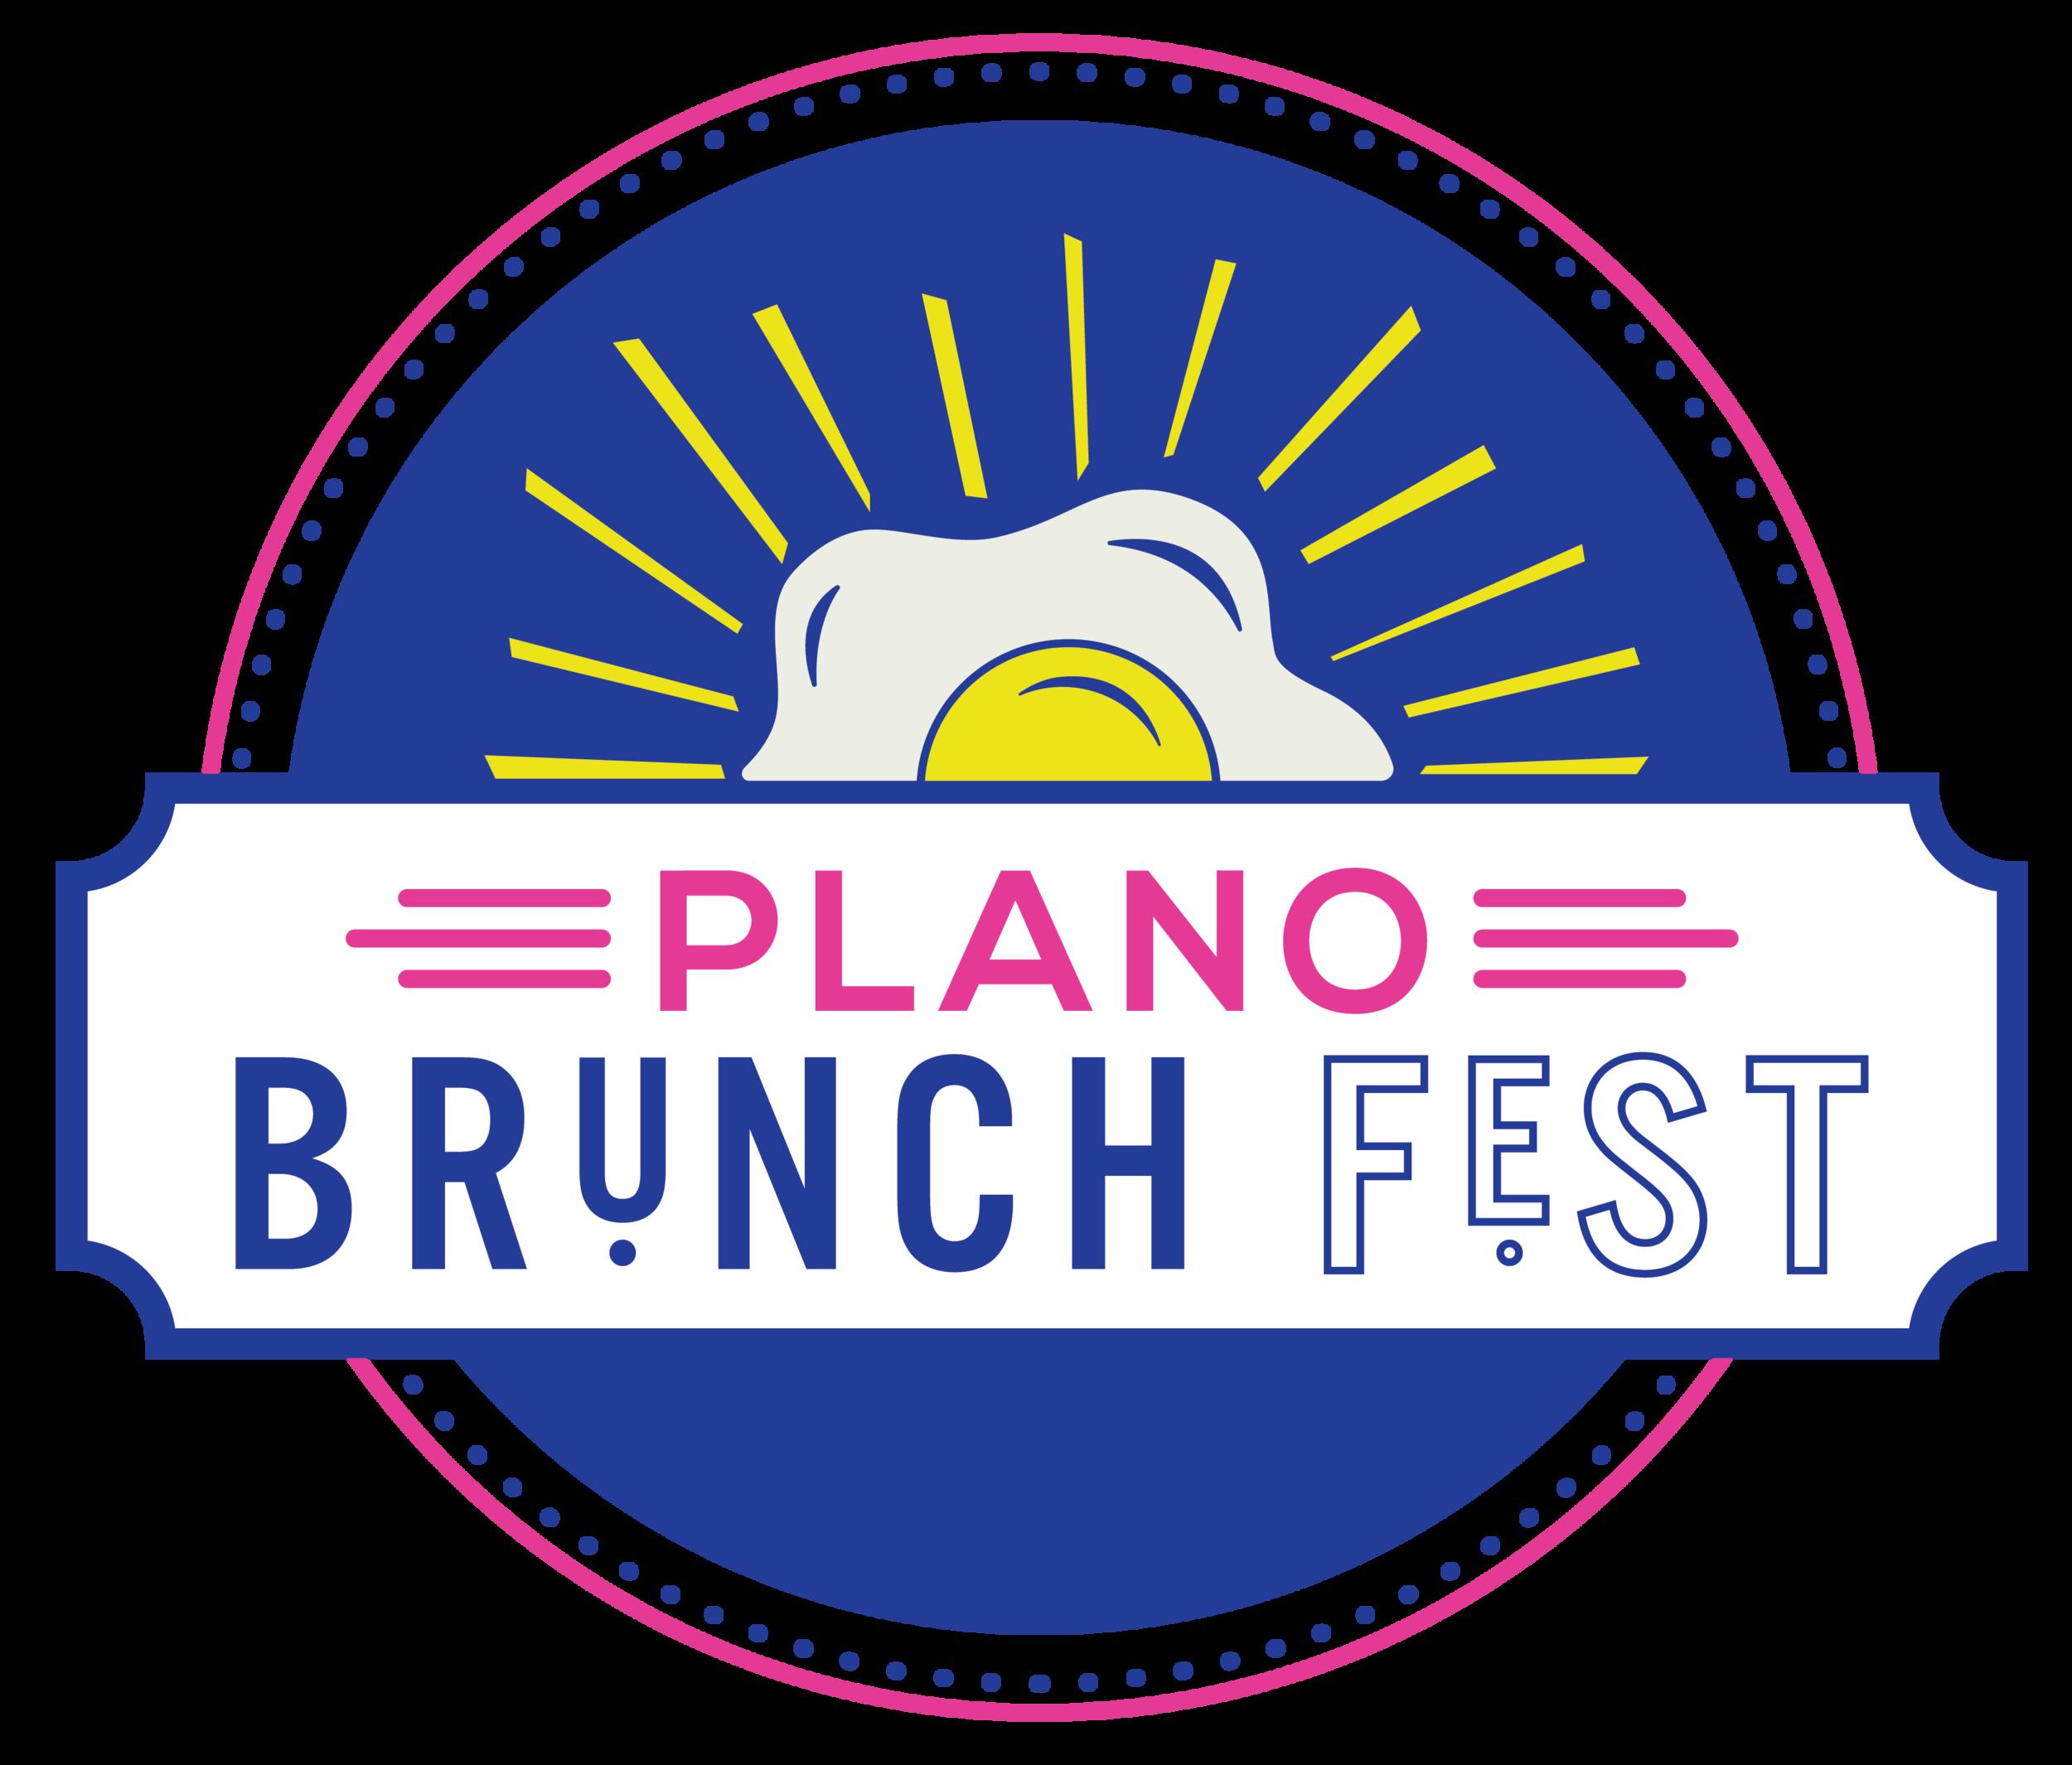 PlanoBrunchFest_Logo2019_BLANK-01.png